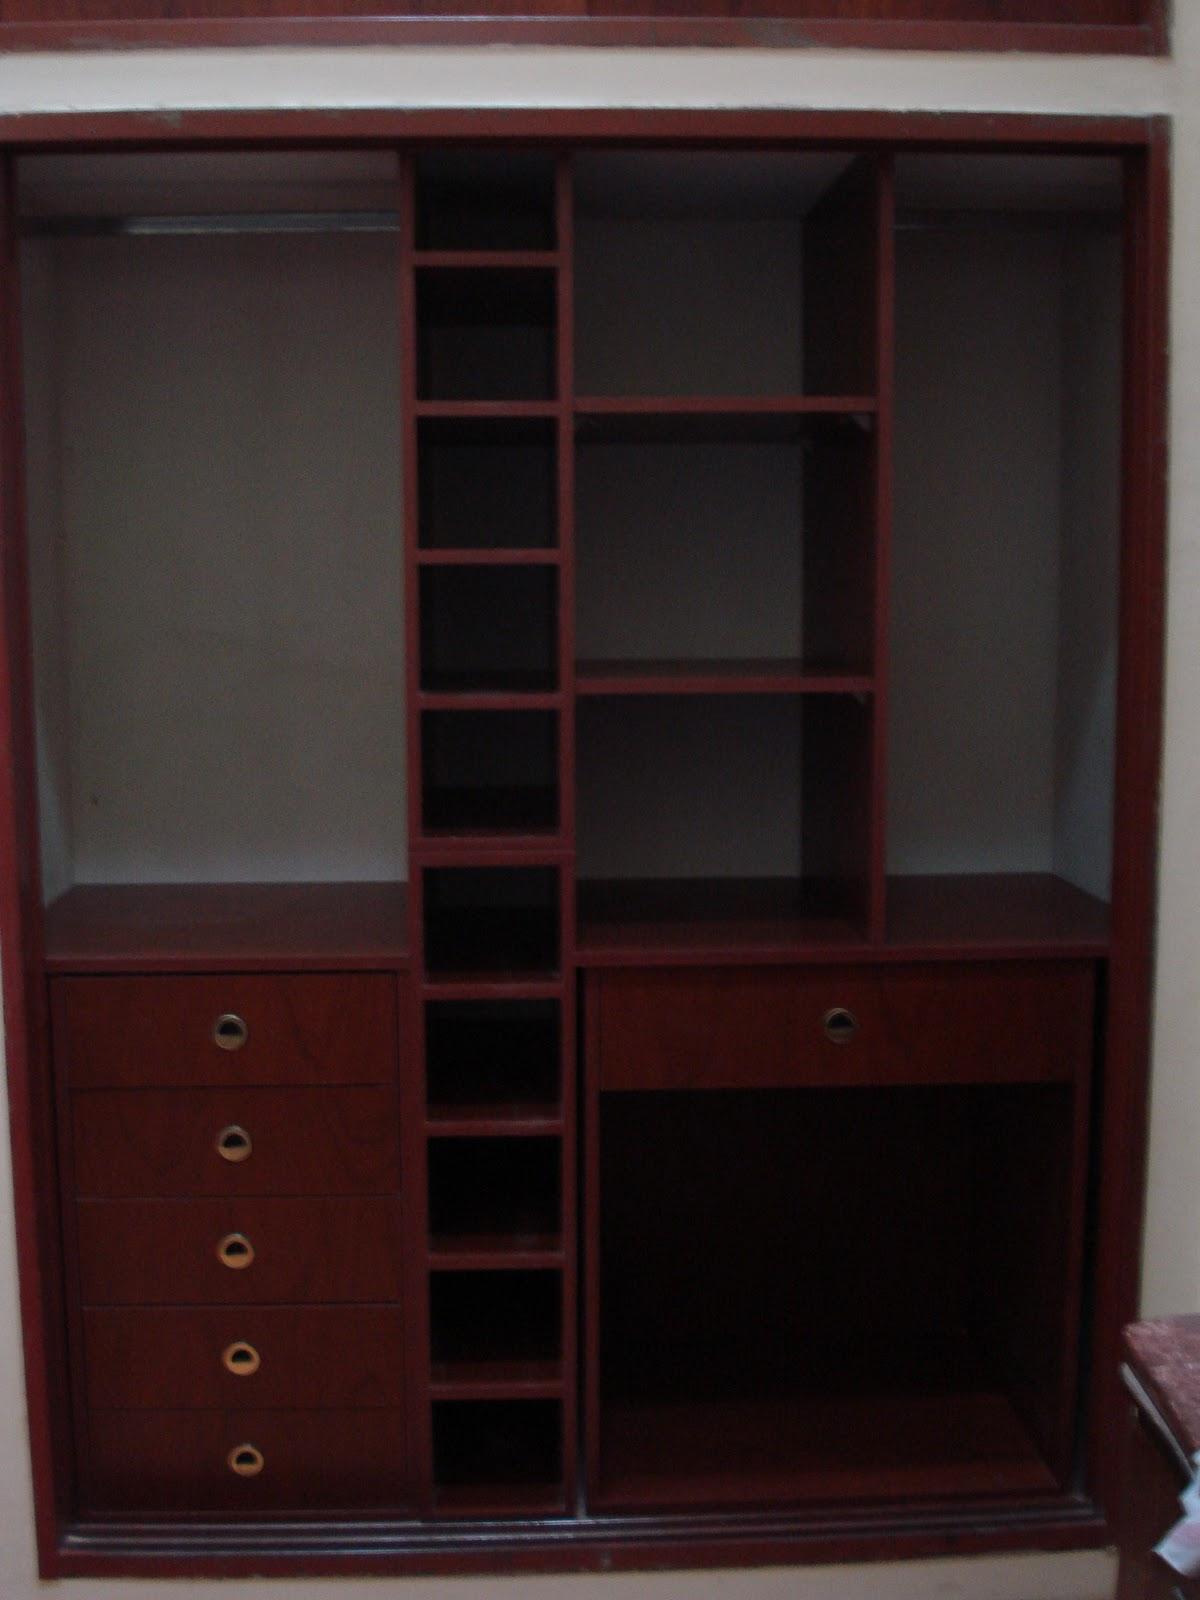 Closet con puertas corredizas madera maple melamina for Closet con puertas corredizas